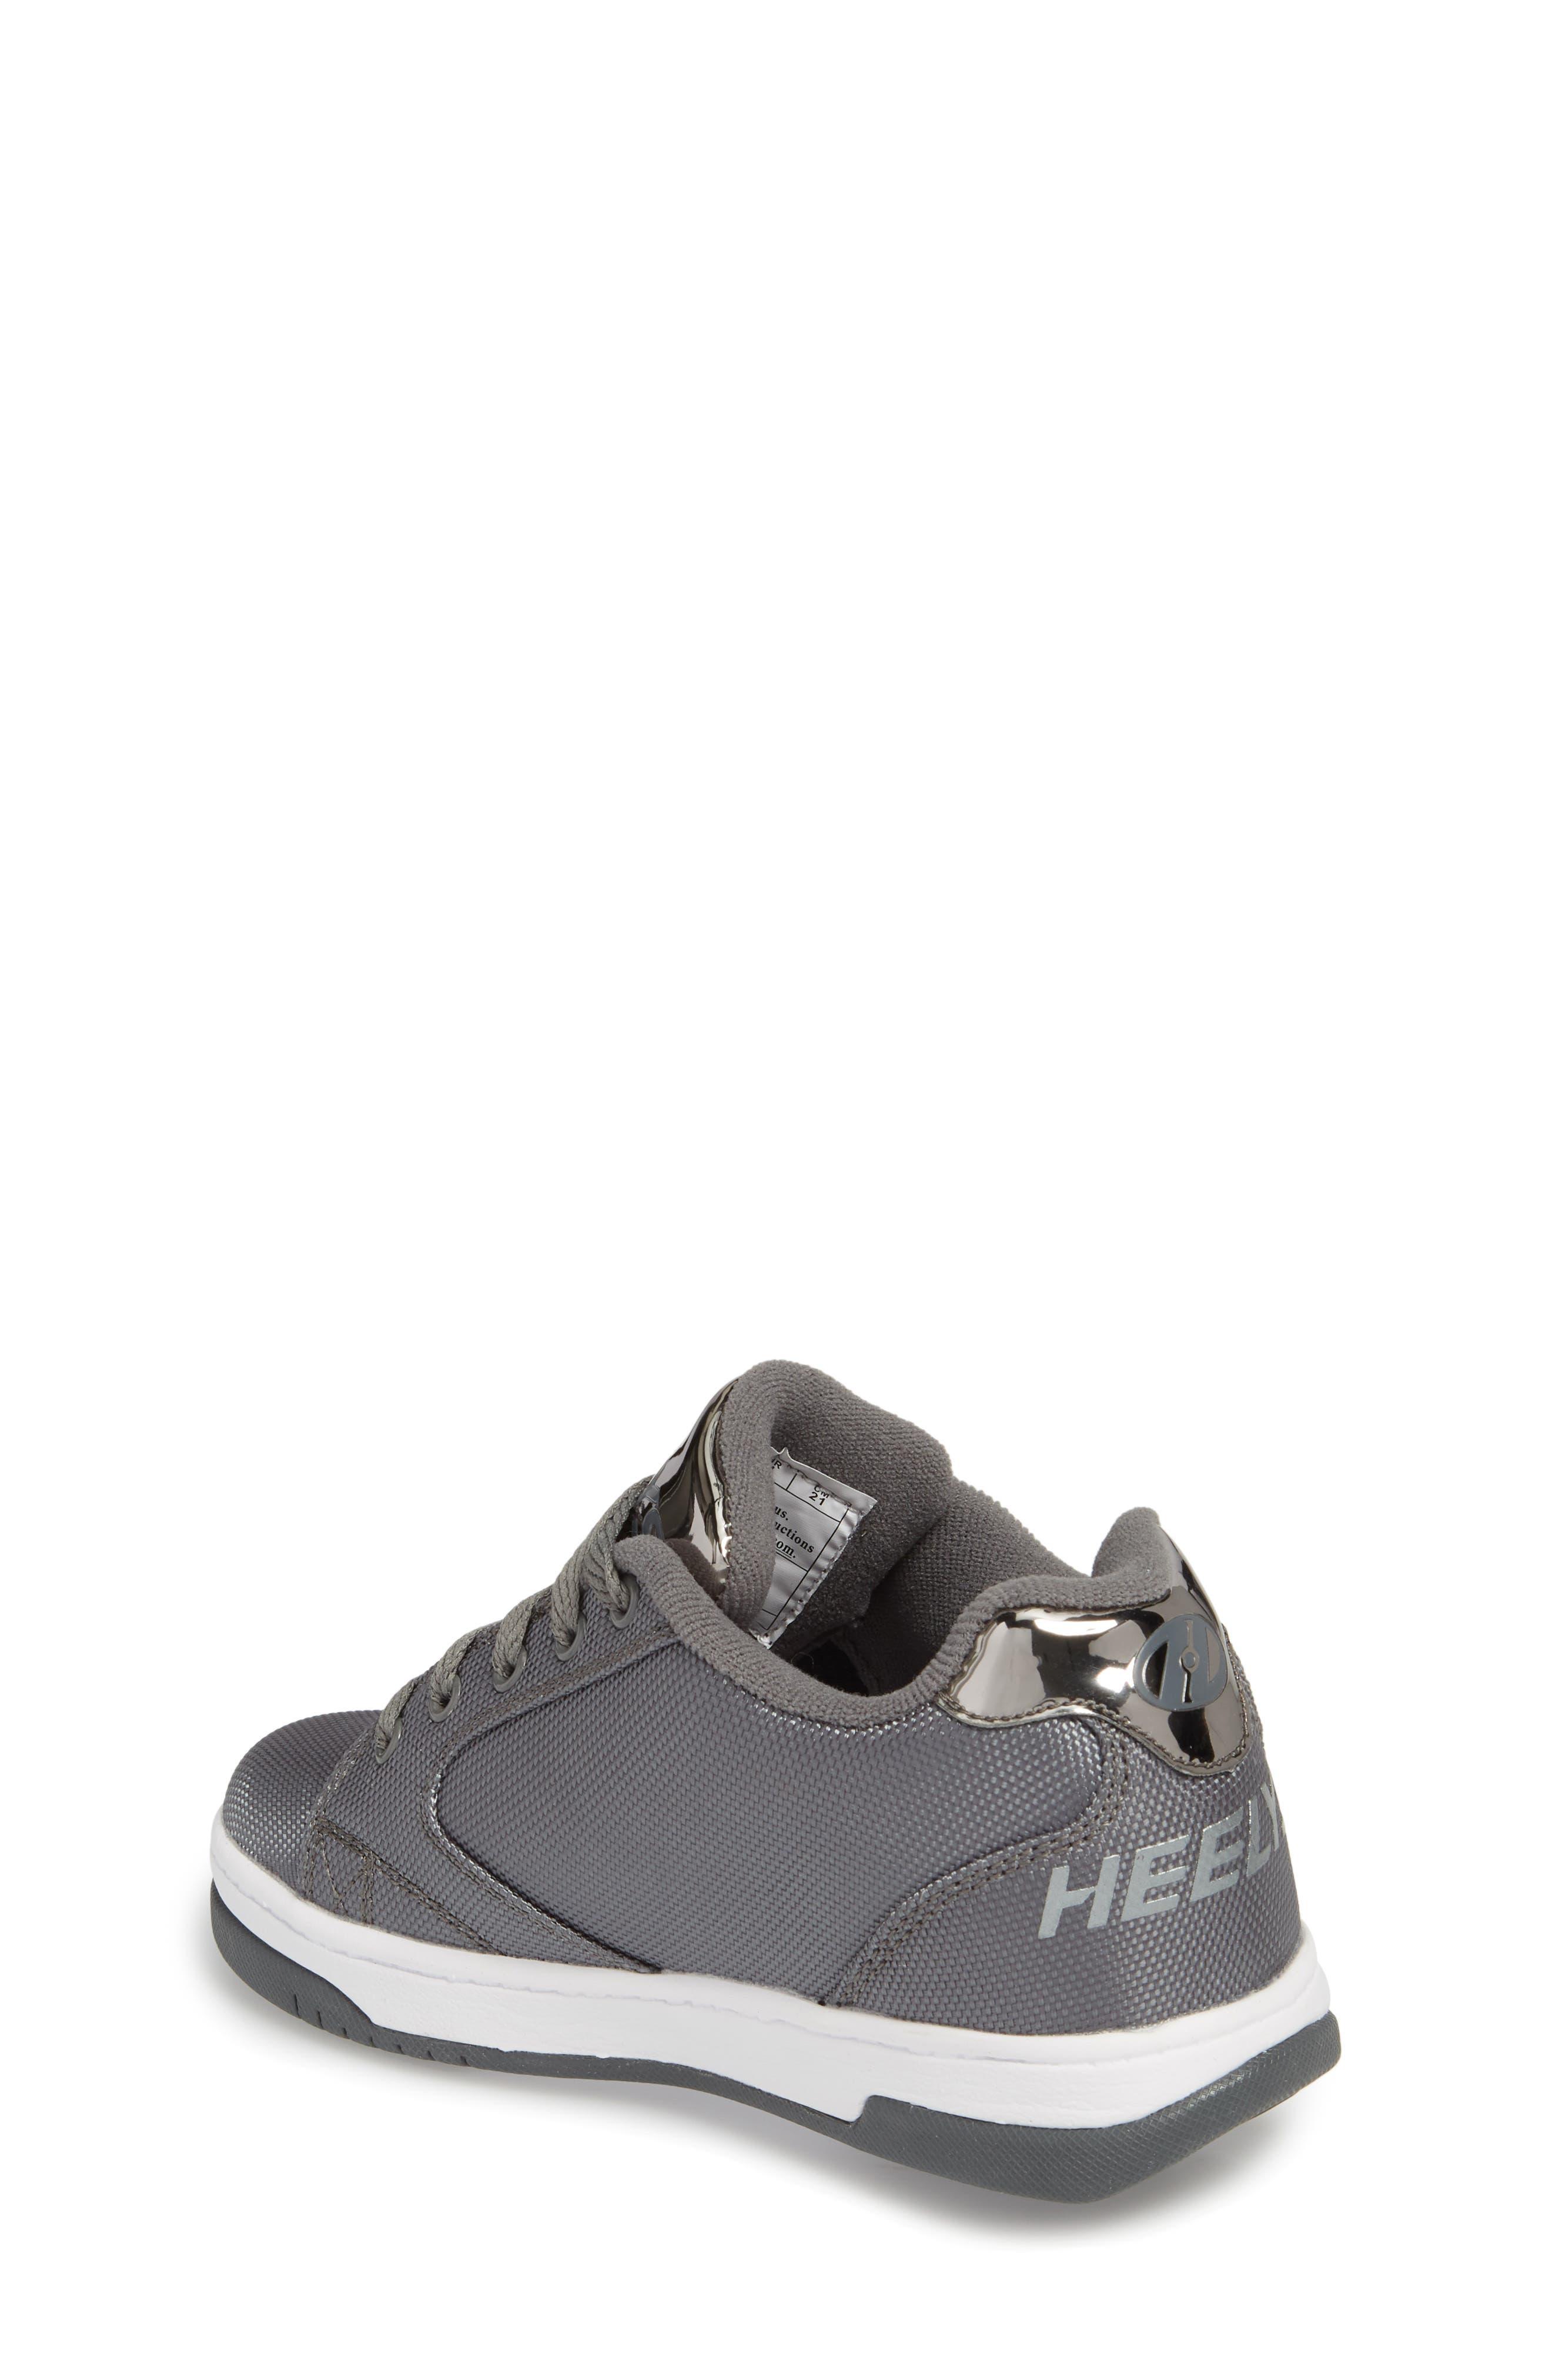 Heels Propel Ballistic Sneaker,                             Alternate thumbnail 2, color,                             Charcoal/ Pewter